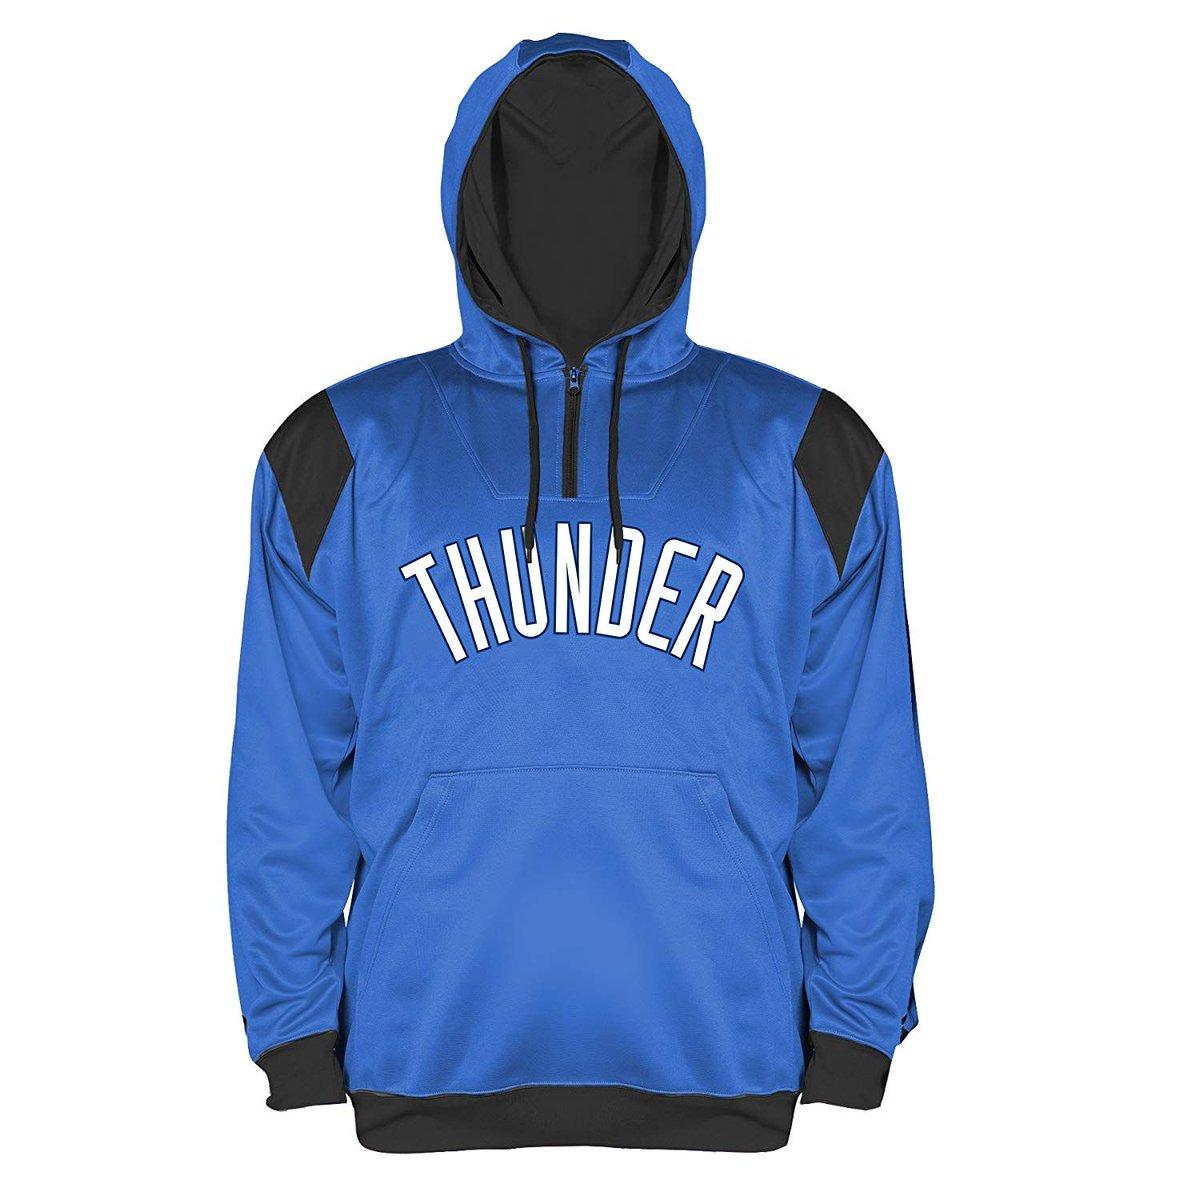 3b8e3b025a0 NBA Men s Big   Tall 1 4 Zip Synthetic Pullover Hoodie starting at  10.02!  https   amzn.to 2NuZvv5 pic.twitter.com RqR3wnyypo